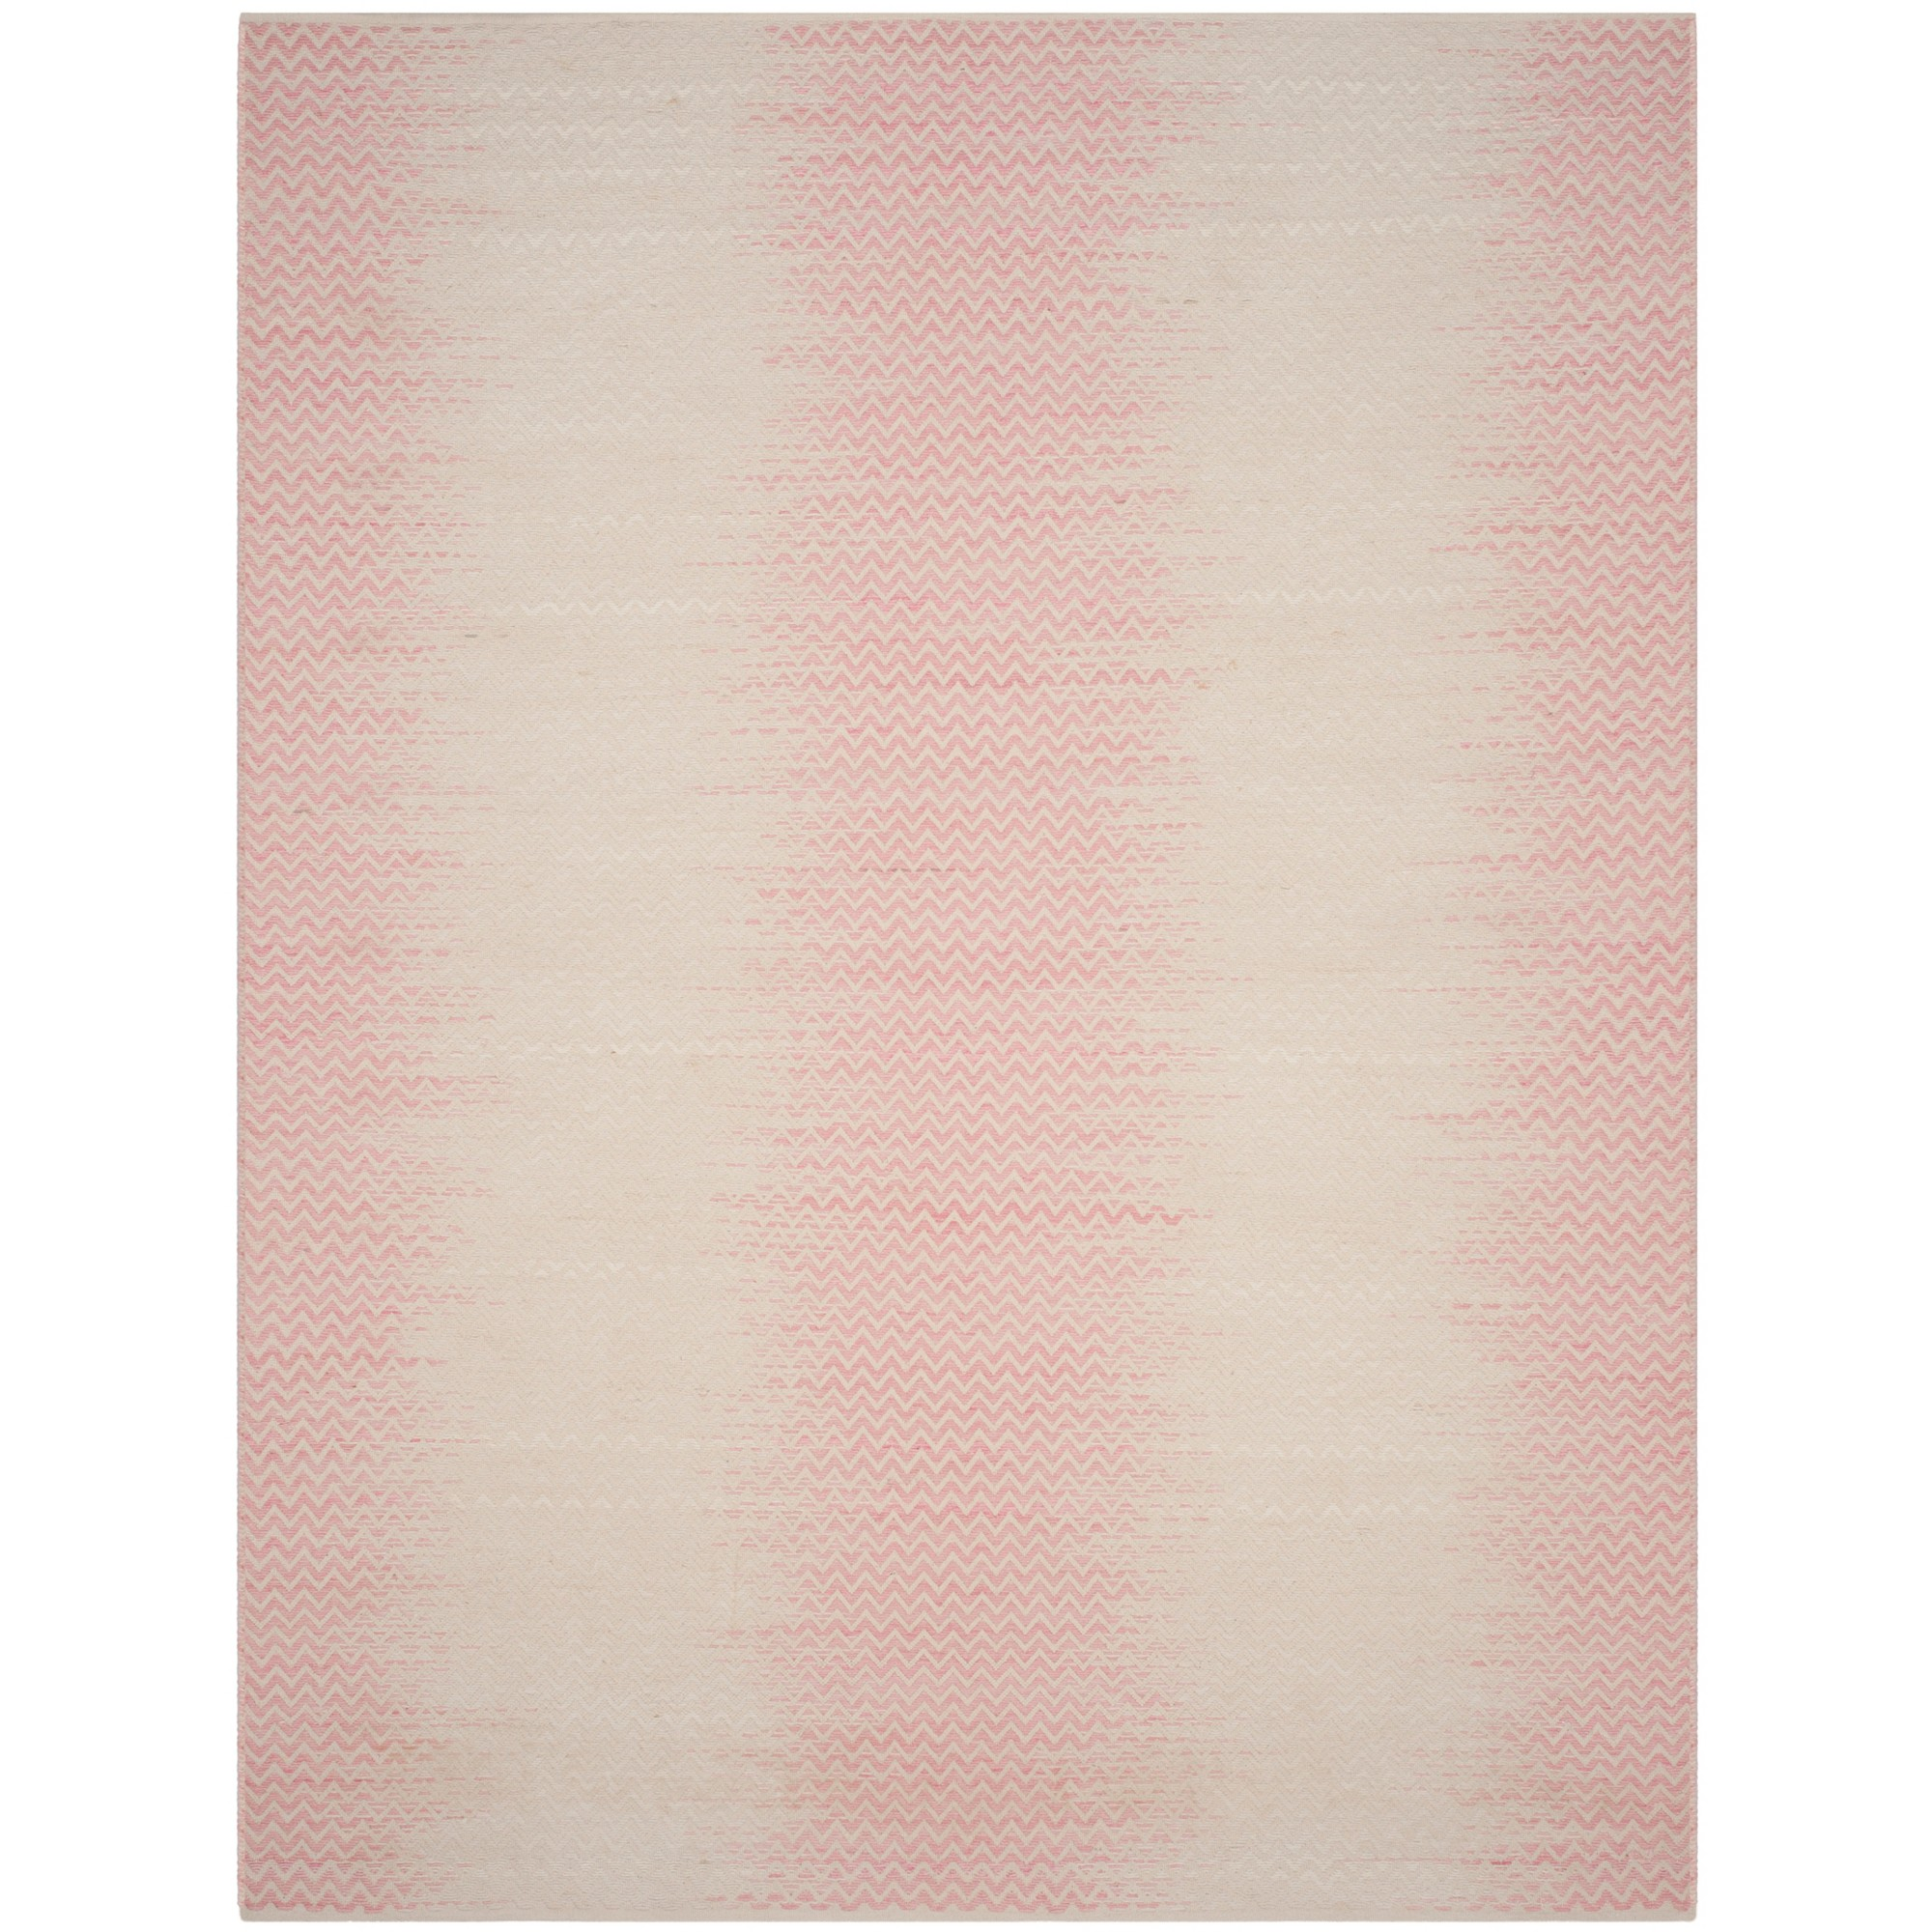 8'X10' Chevron Woven Area Rug Light Pink/Ivory - Safavieh